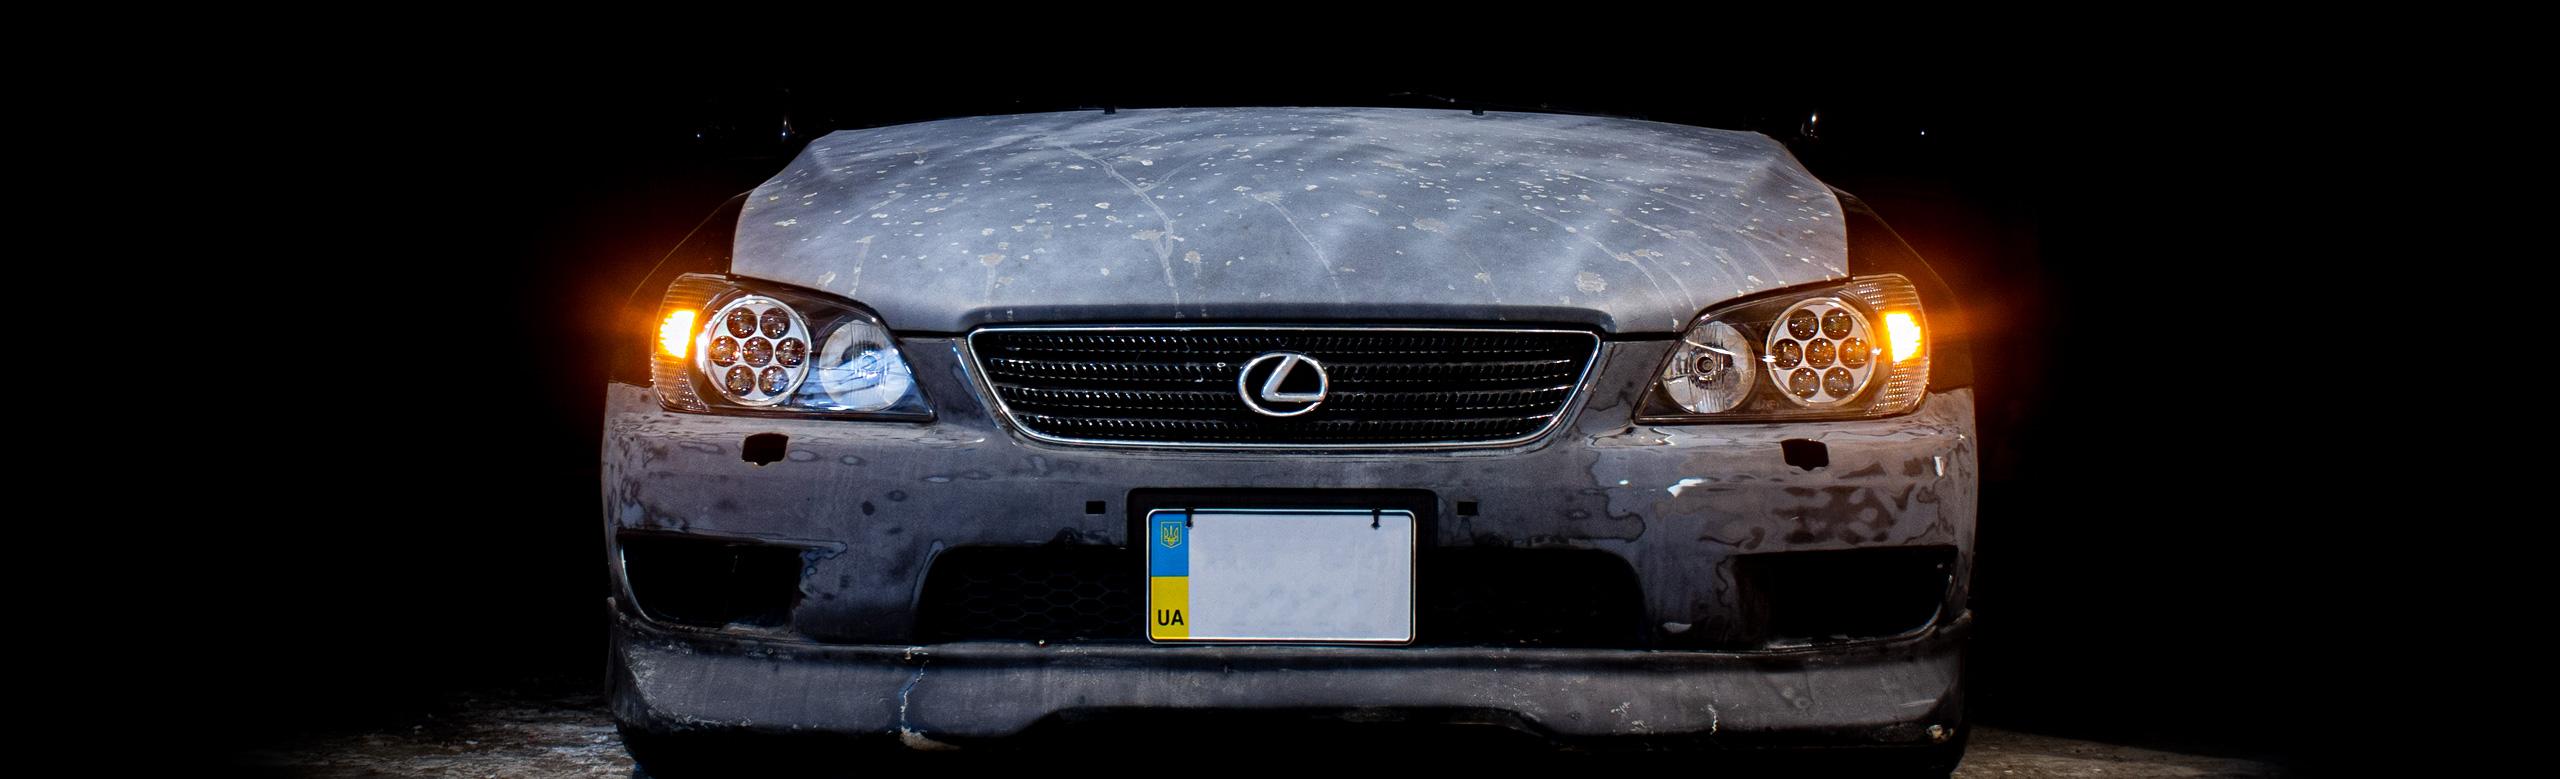 LEXUS IS V8 установка монолинз с Nissan Cima